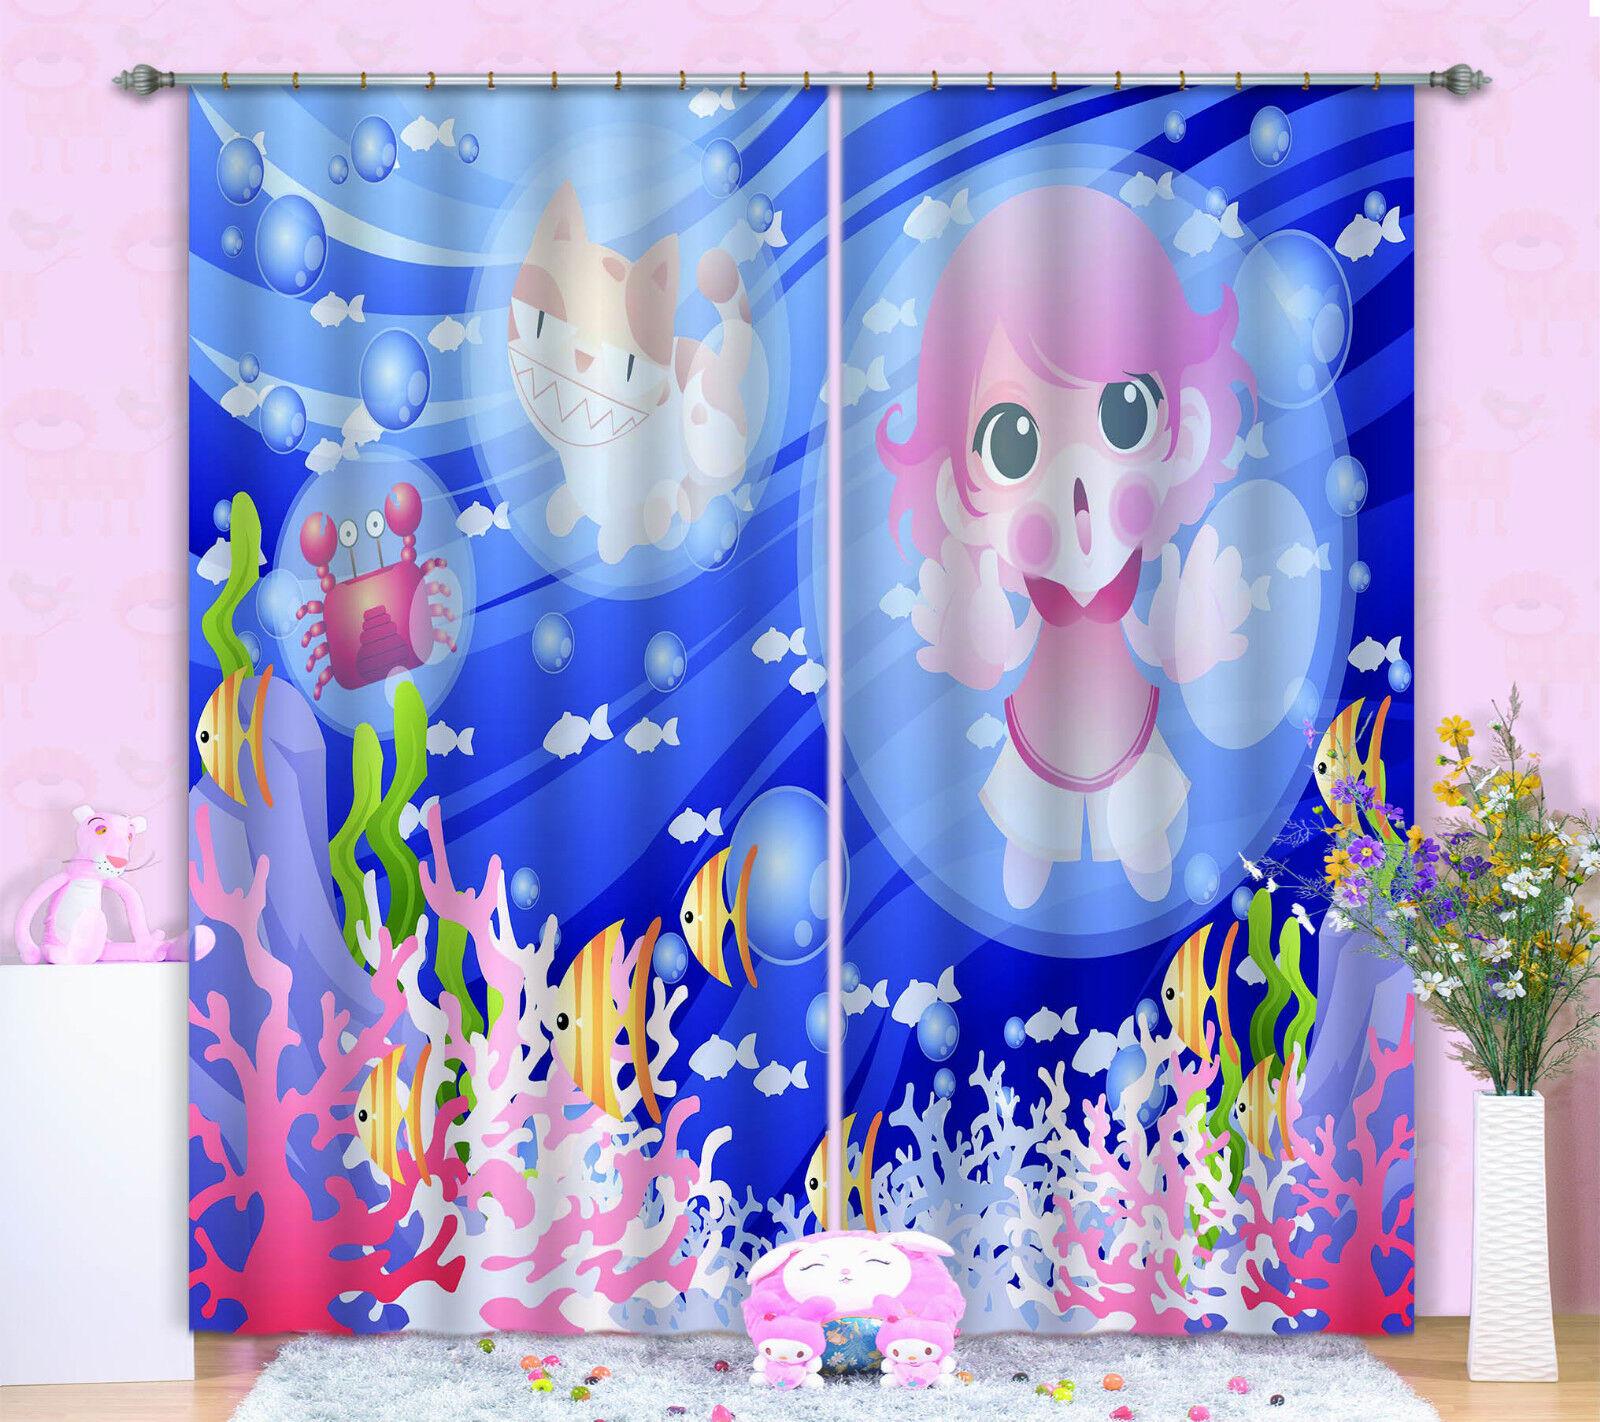 3d Oceano bambina 463 blocco foto sipario pressione sipario tende tessuto finestra de